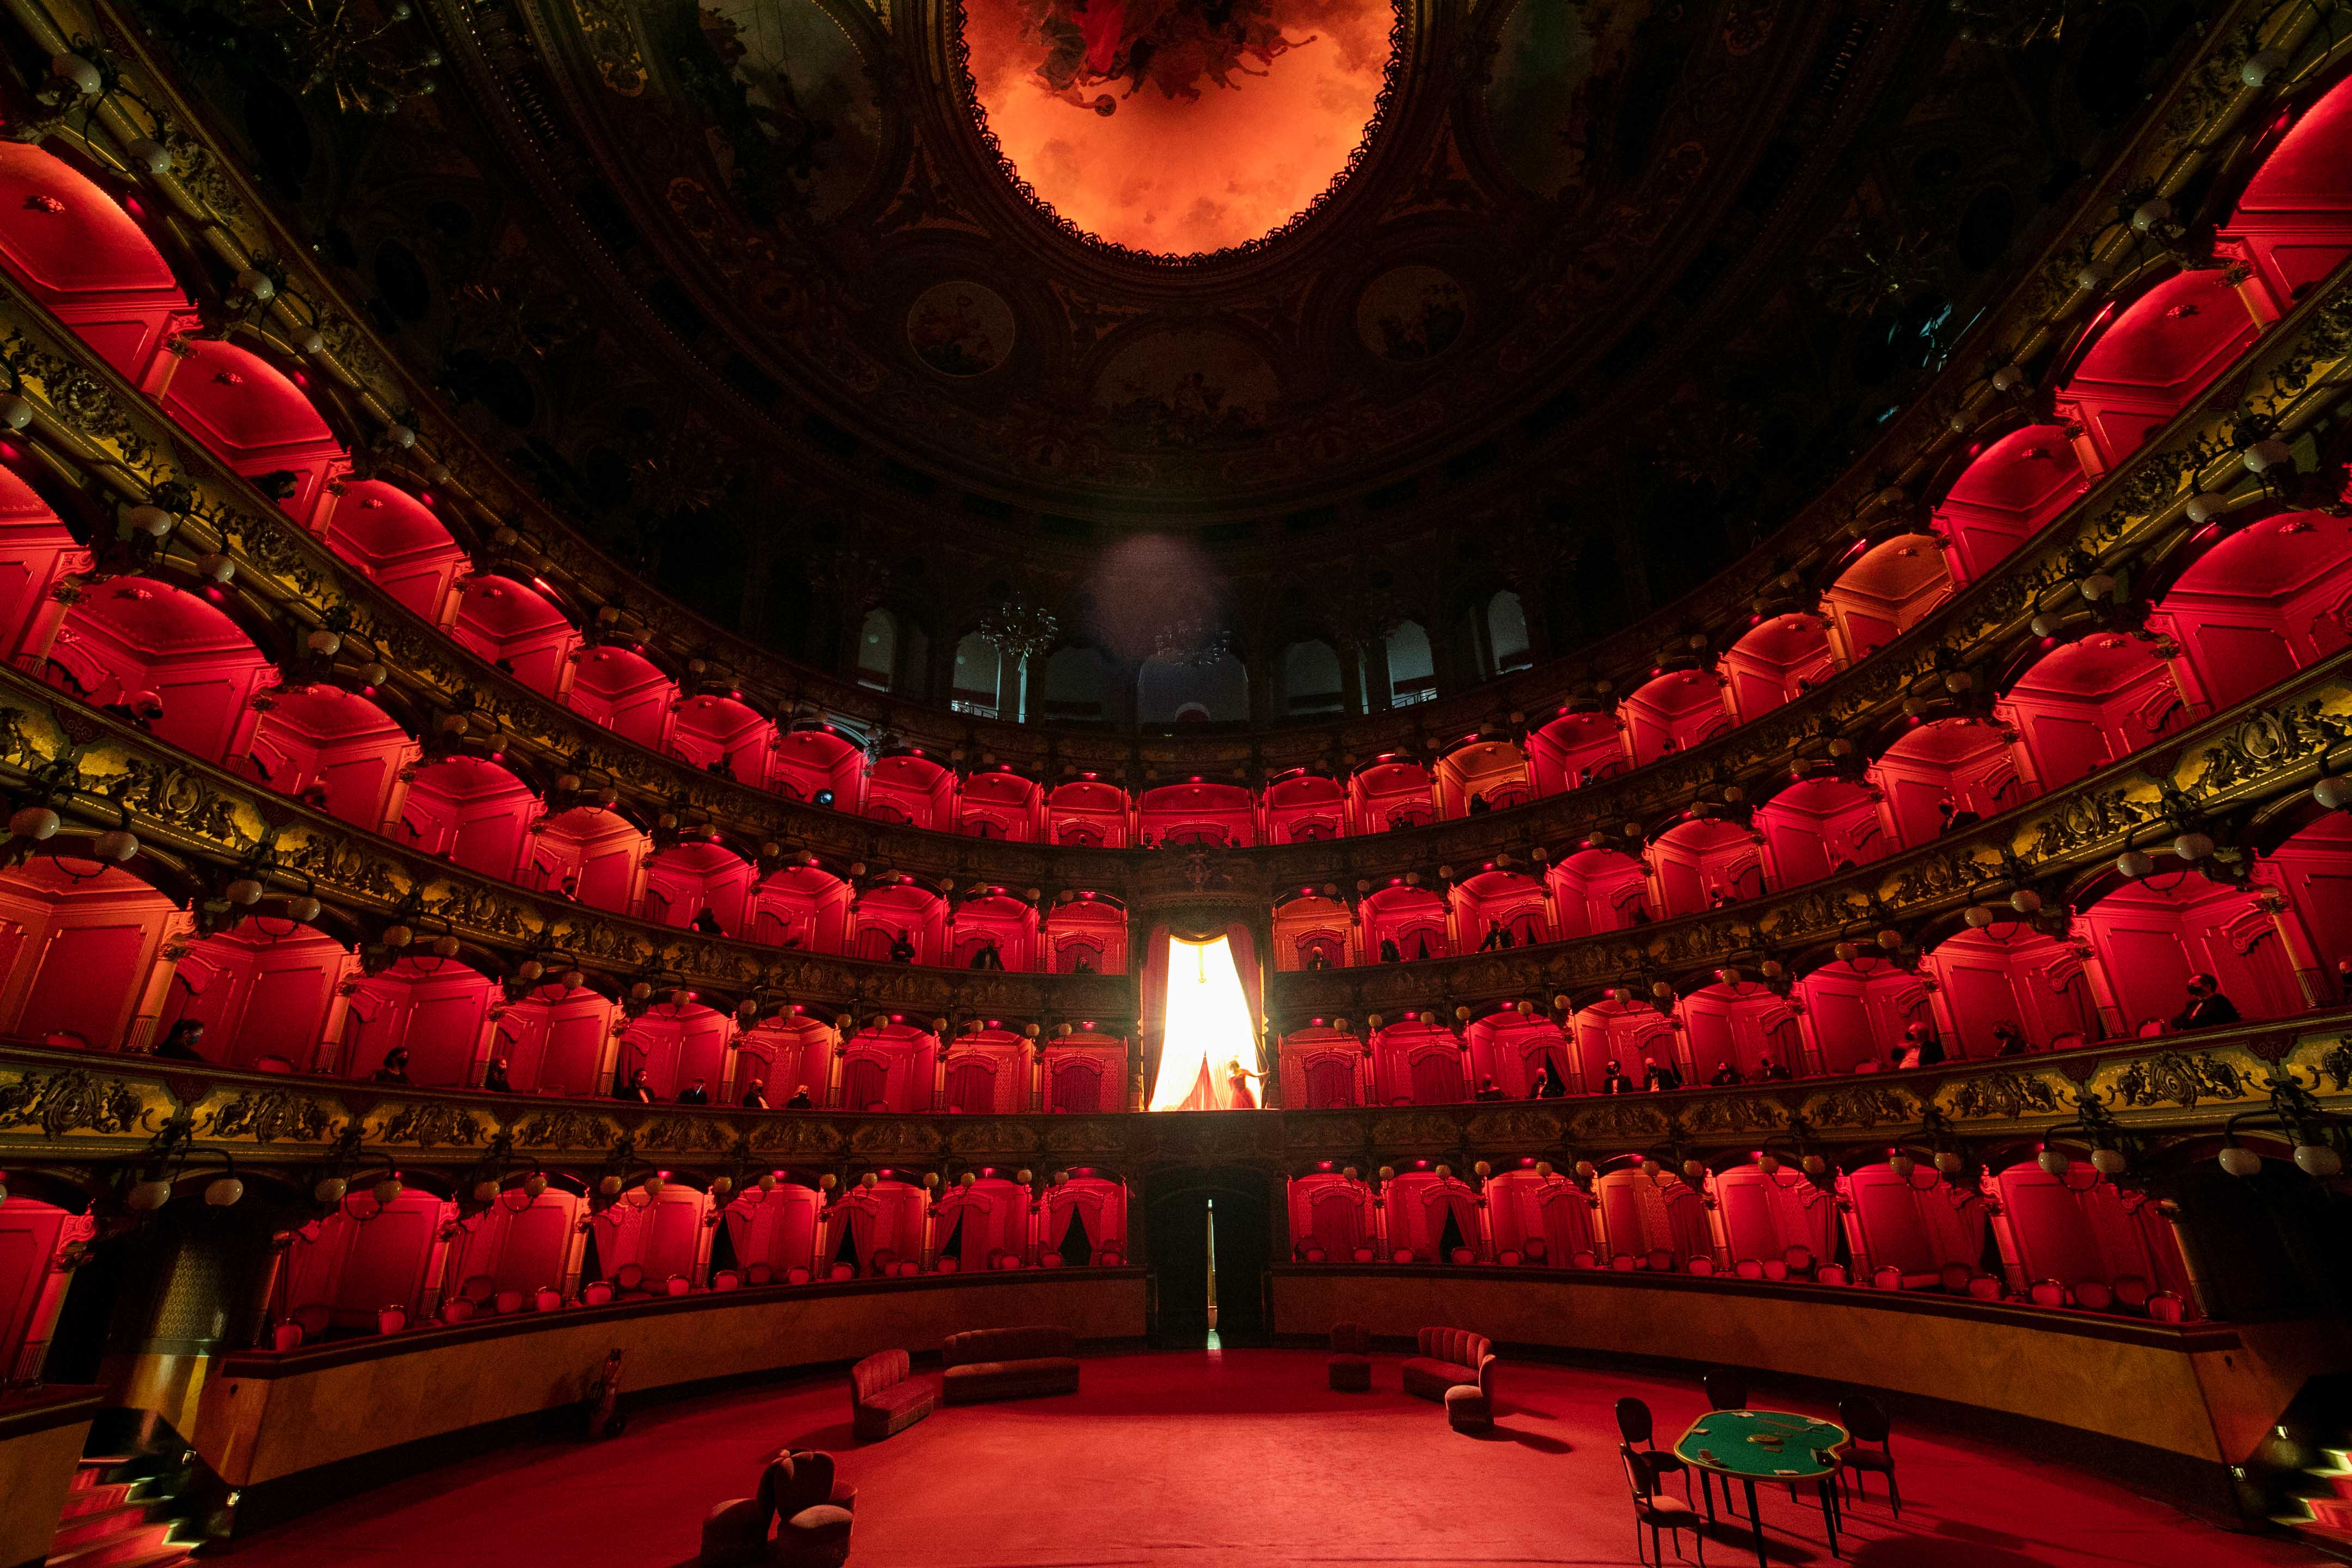 La Traviata - Teatro Massimo Vincenzo Bellini, Catania - ® Giacomo Orlando